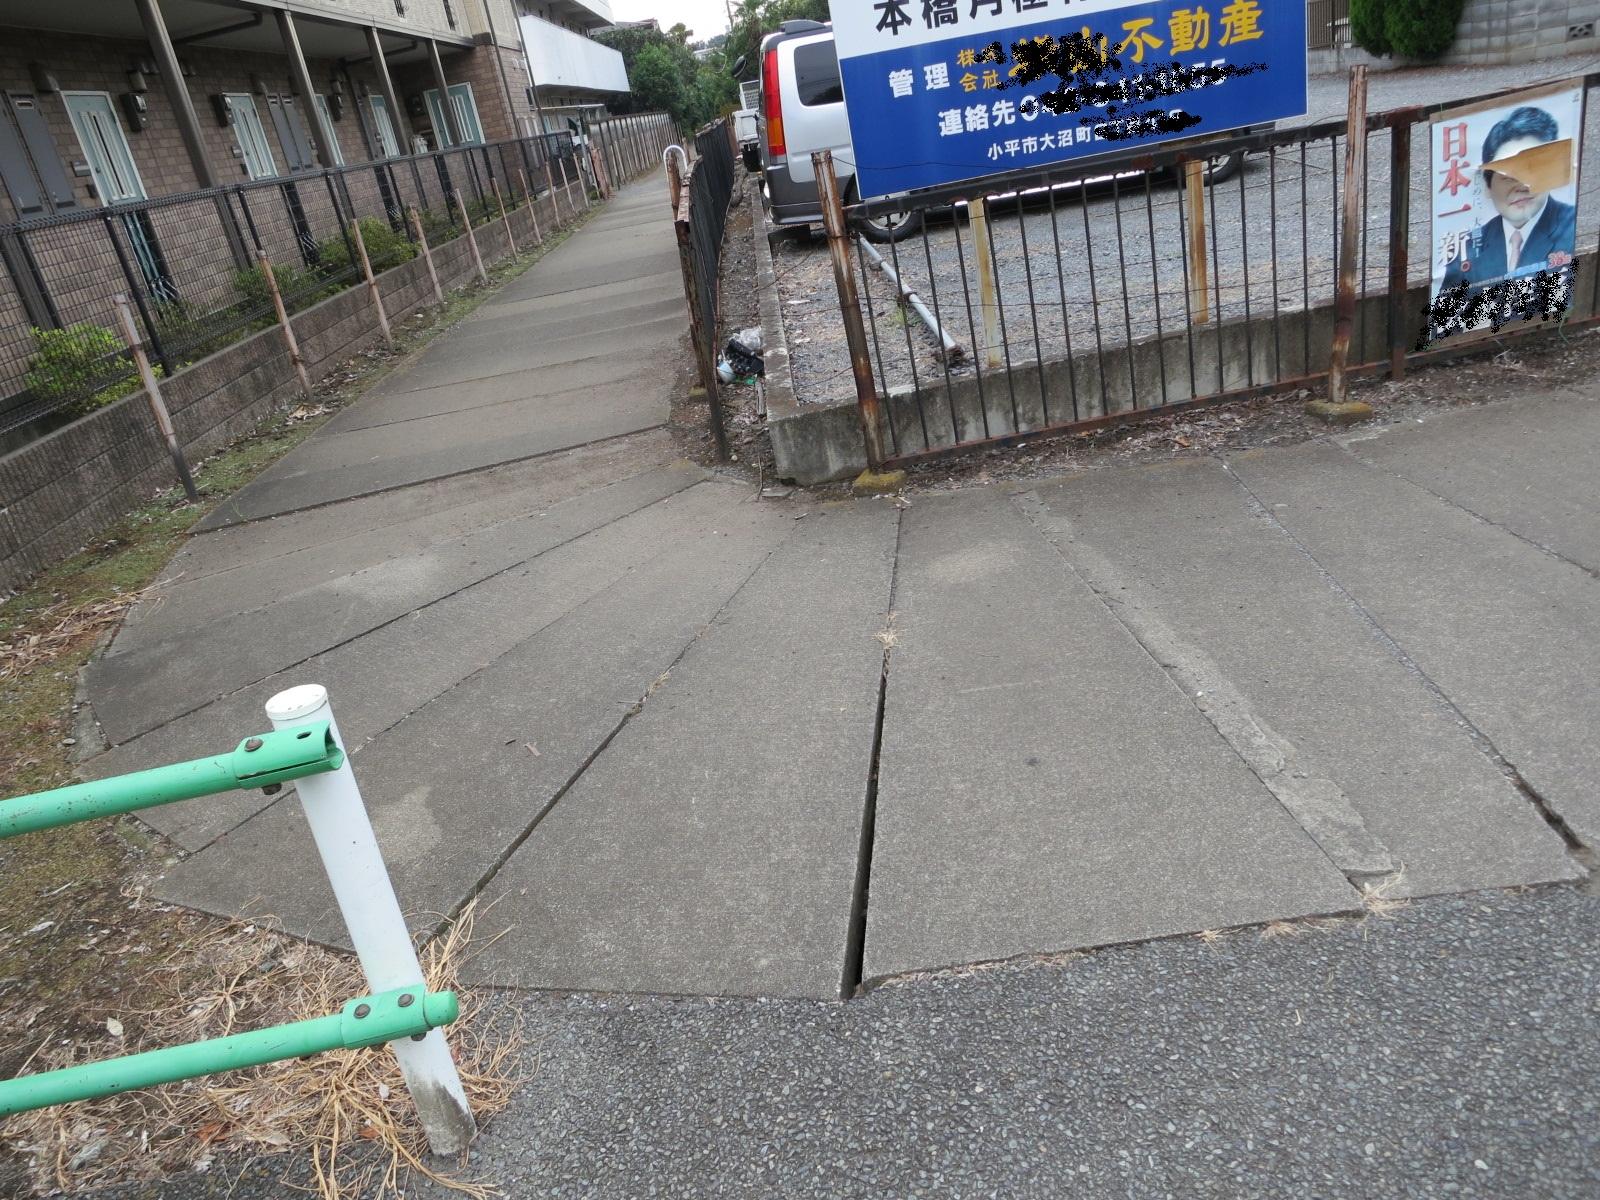 mizbering用画像¥6-5